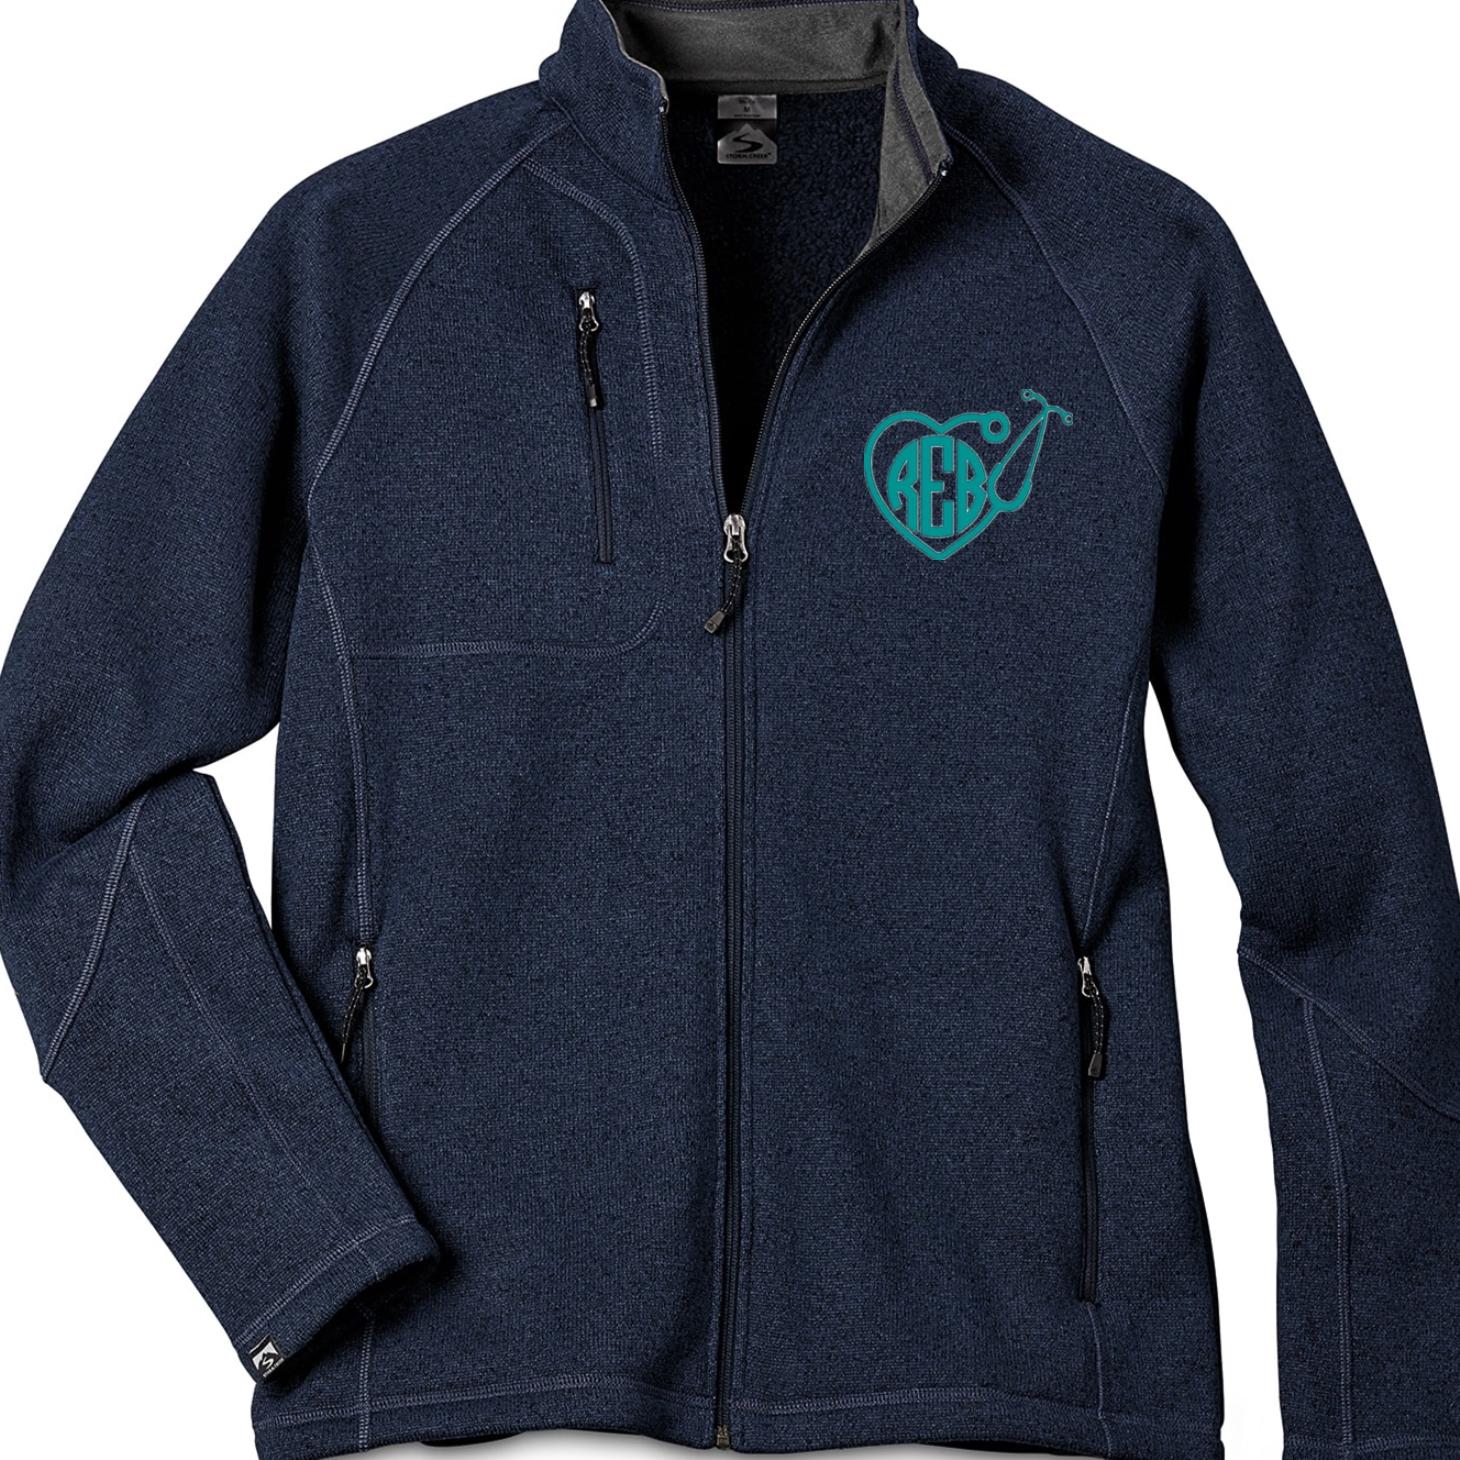 Storm Creek 4620 Mens Sweaterfleece Jacket from NYFifth